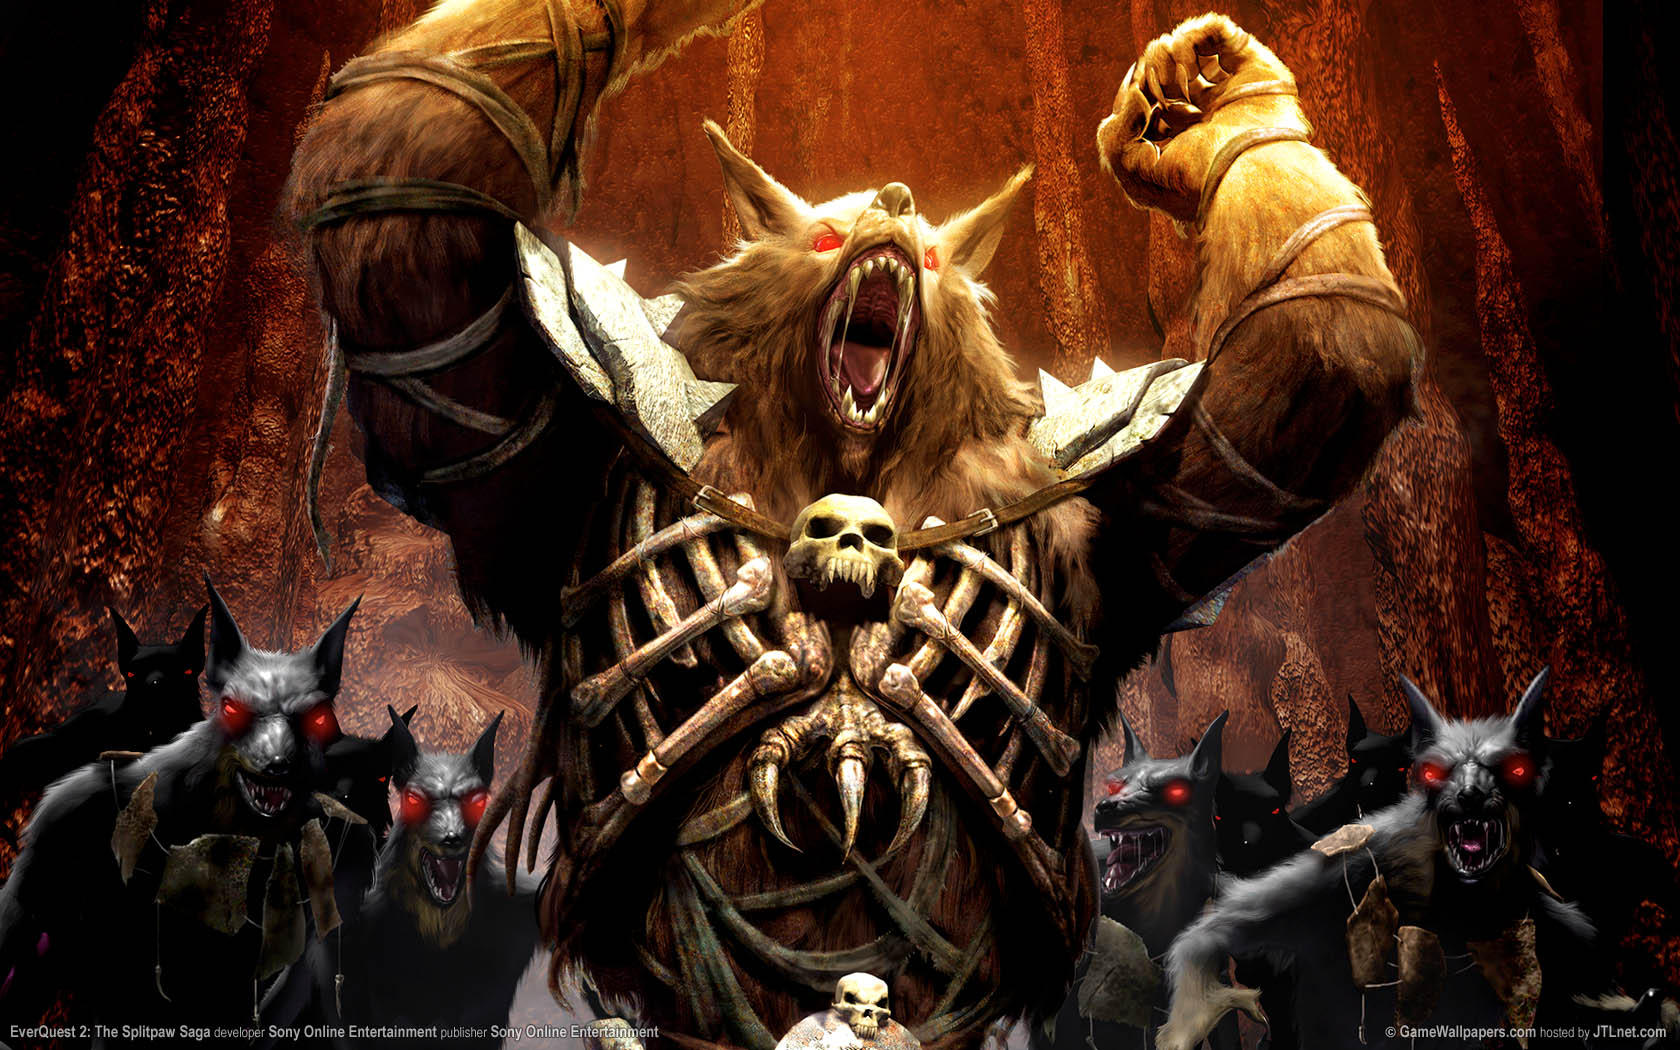 Category:Splitpaw Saga | EverQuest 2 Wiki | FANDOM powered